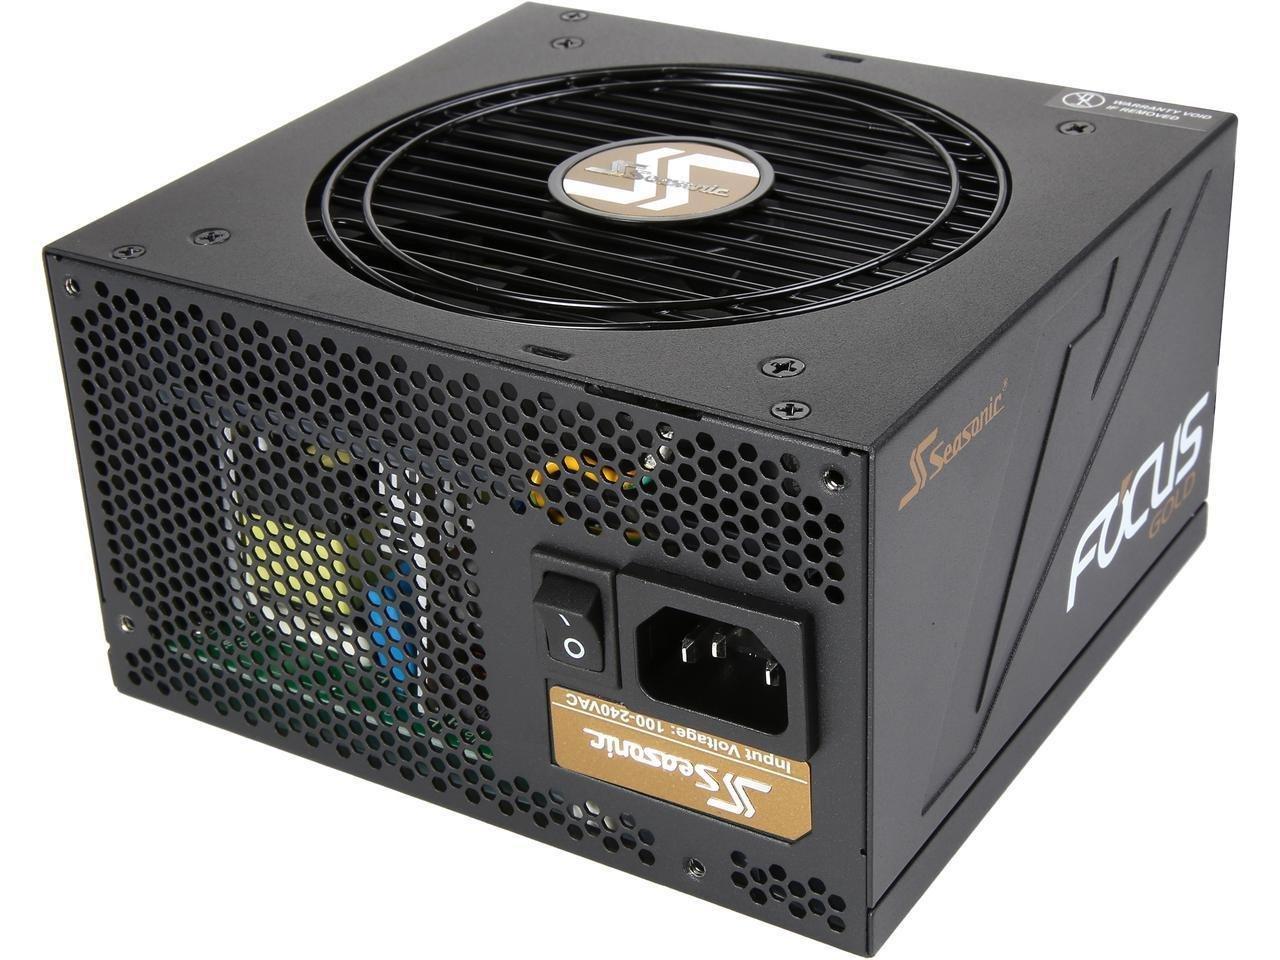 Seasonic 450 Watt FOCUS Gold Semi Modular ATX PSU/Power Supply £49.99 at Scan